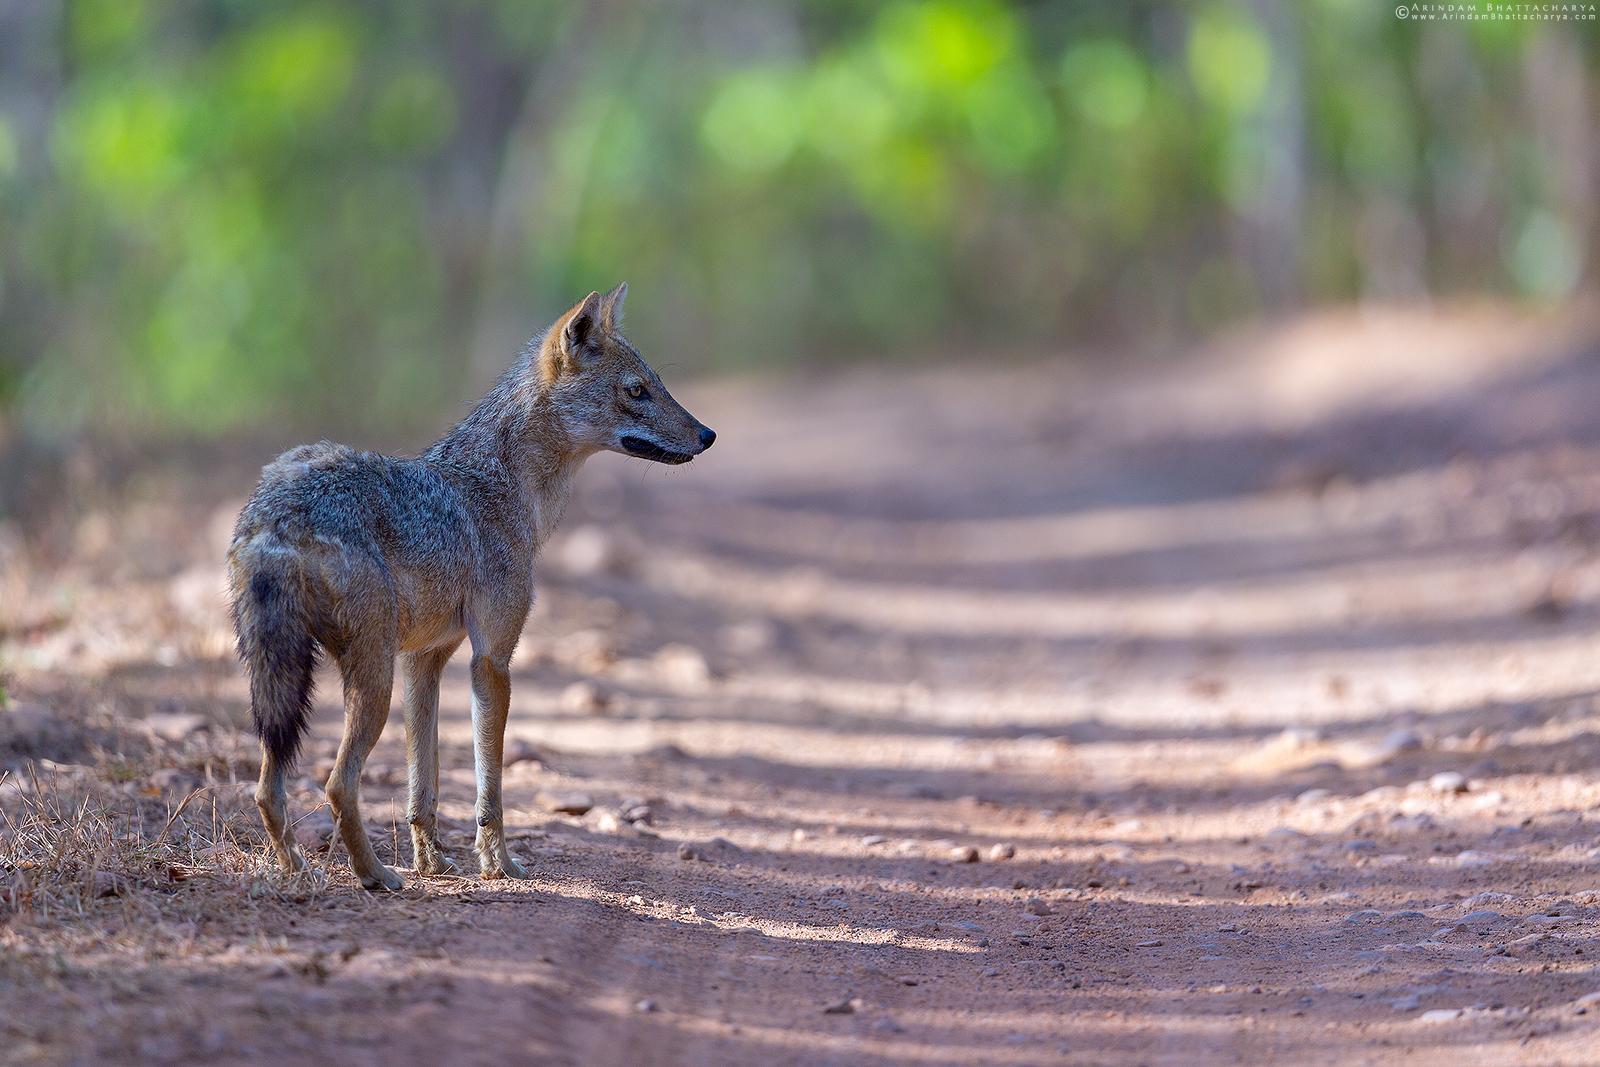 Golden Jackal or Common Jackal or Canis aureus in Kanha National Park, Madhya Pradesh, India